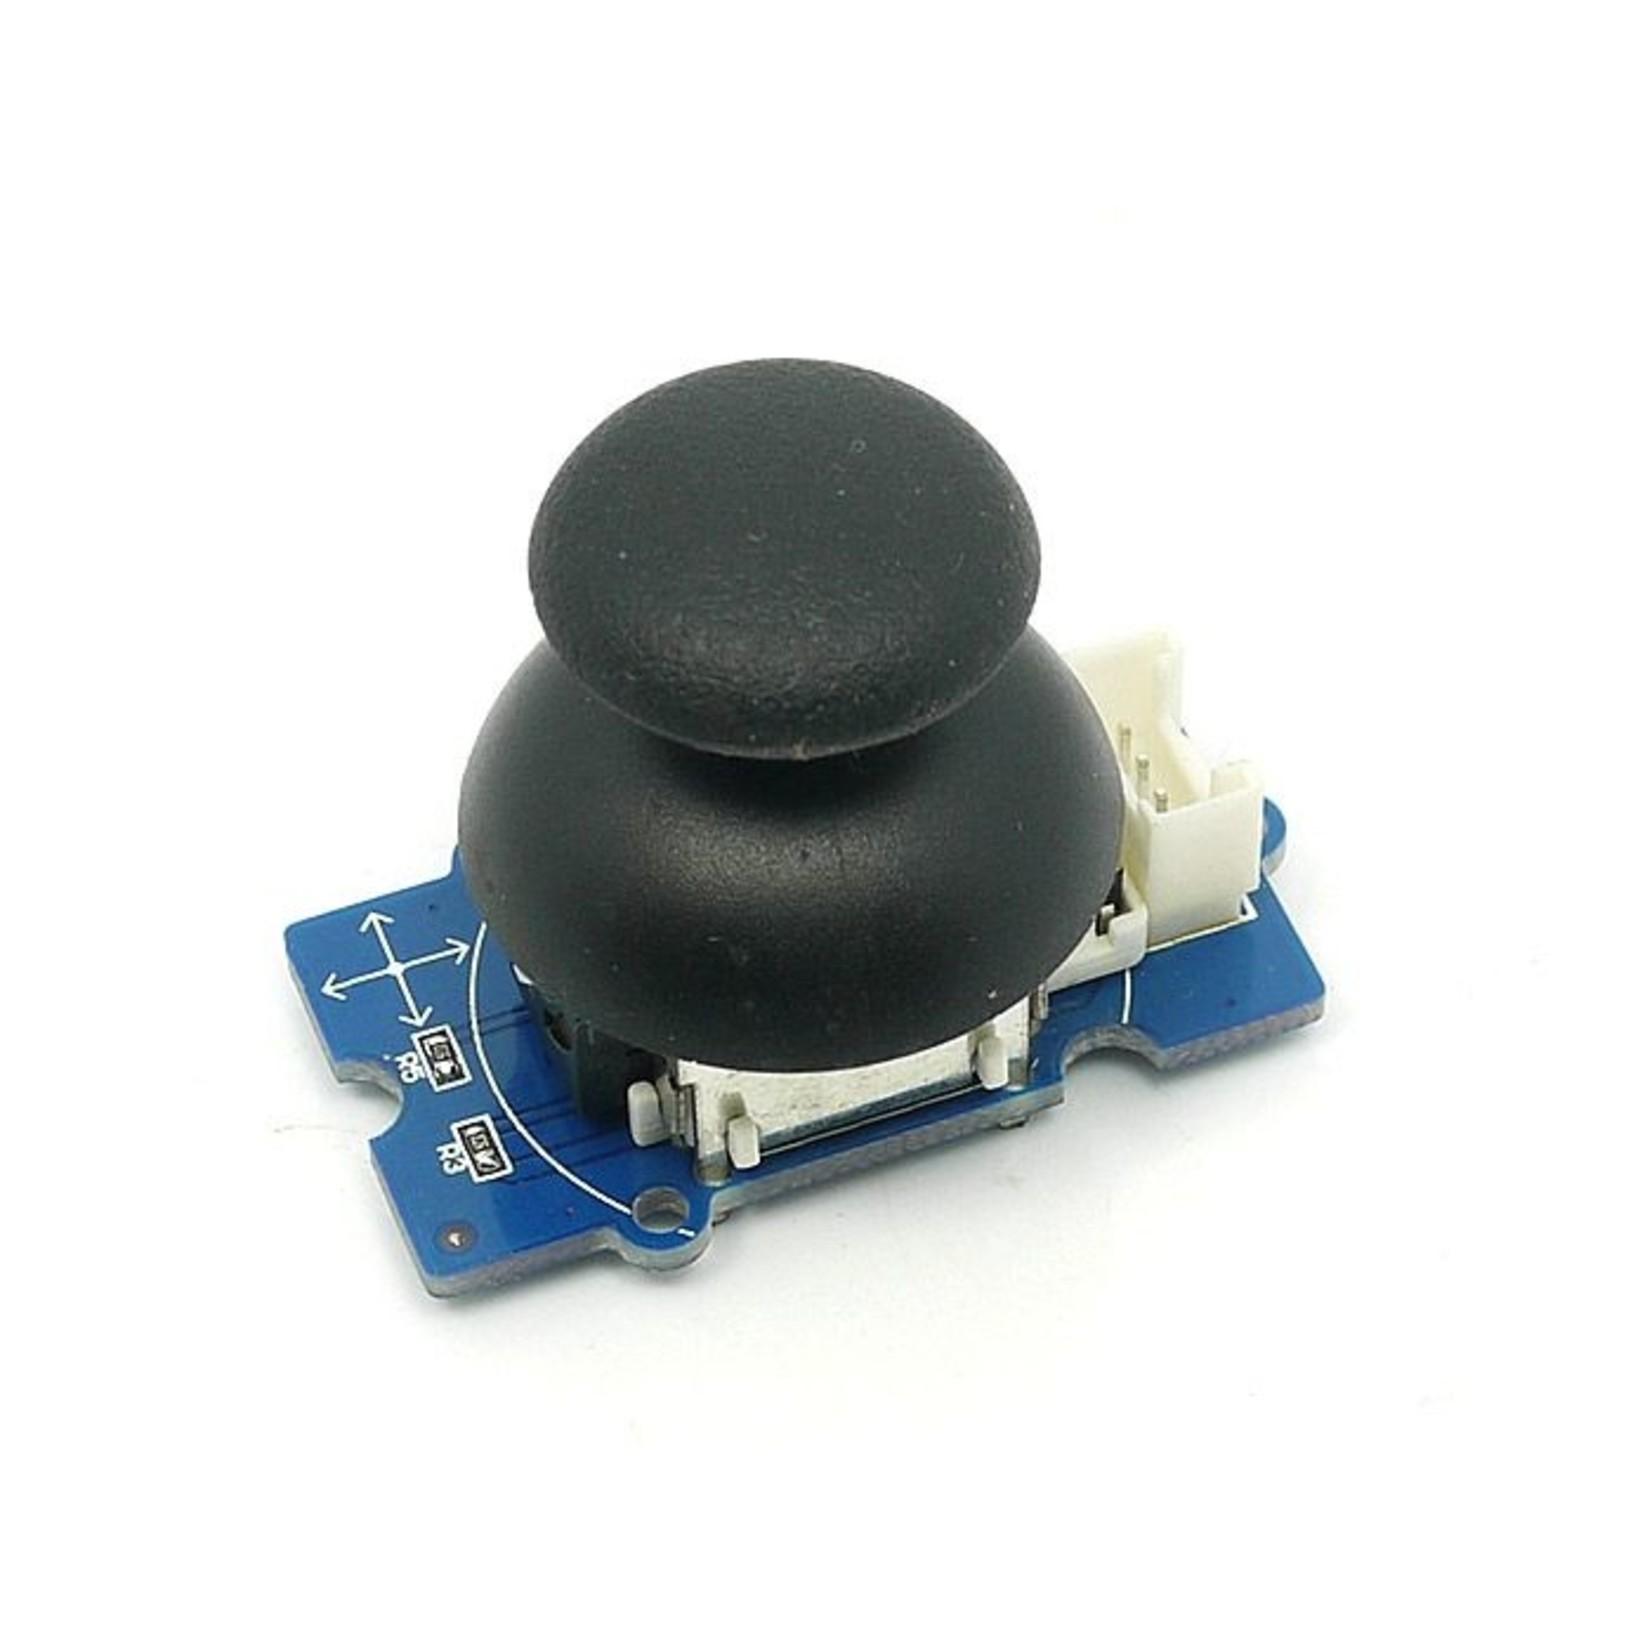 Seeed Grove - Thumb Joystick